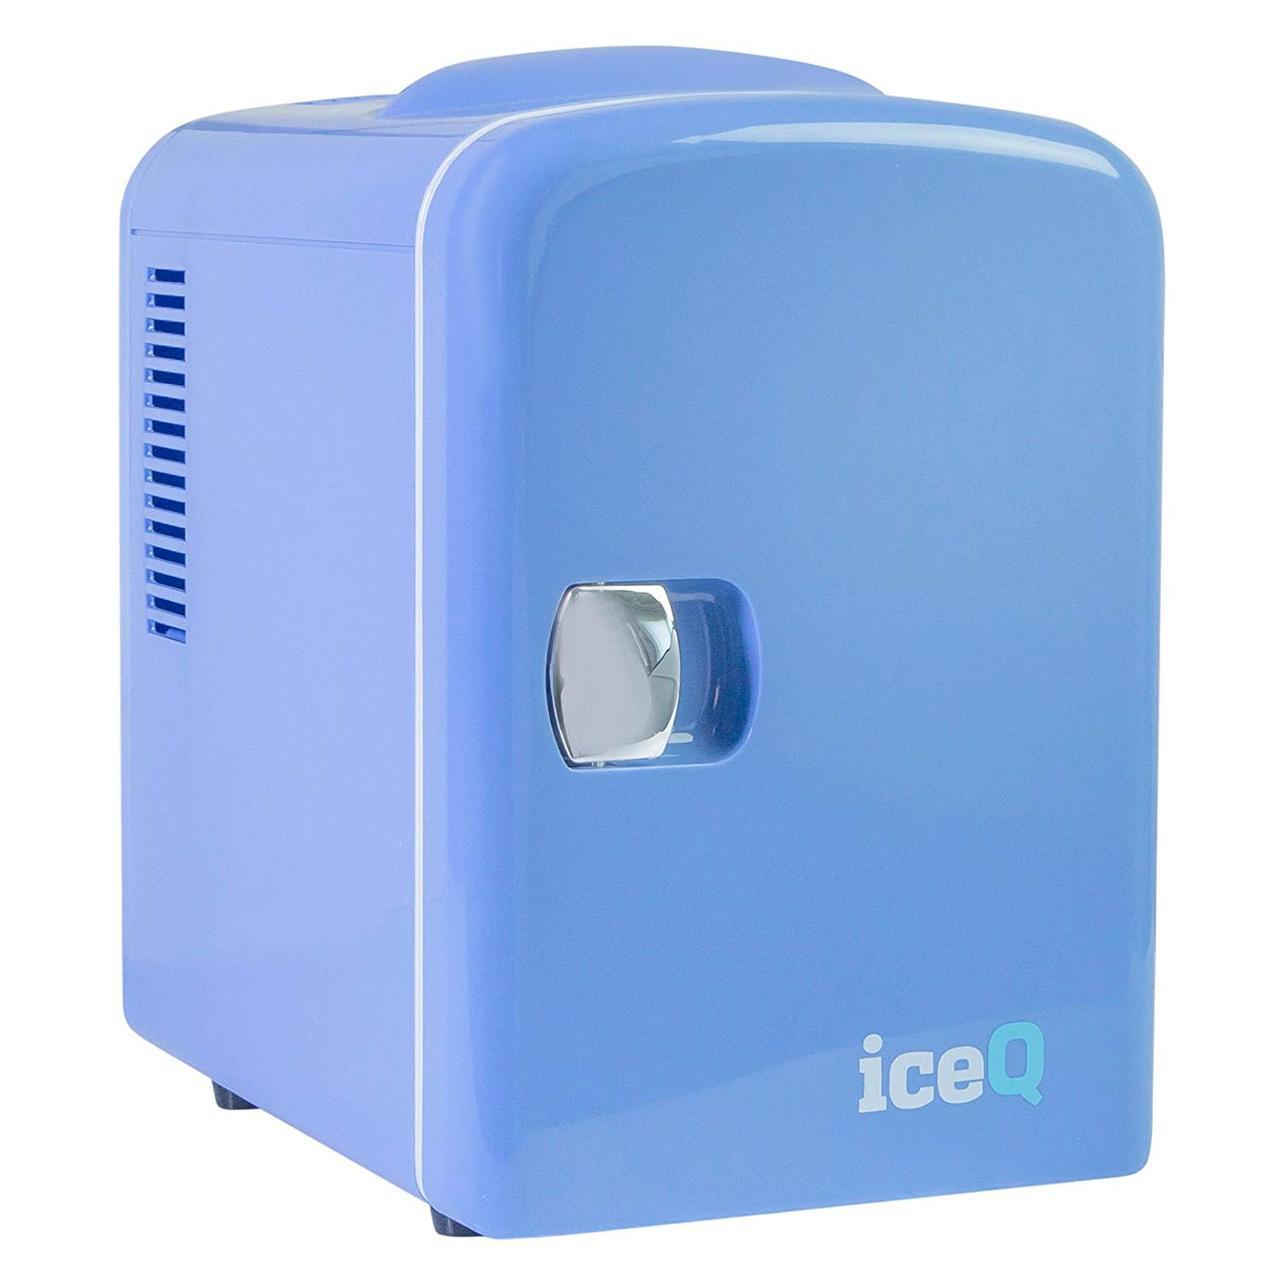 Маленький мини-холодильник на 4 литра iceQ